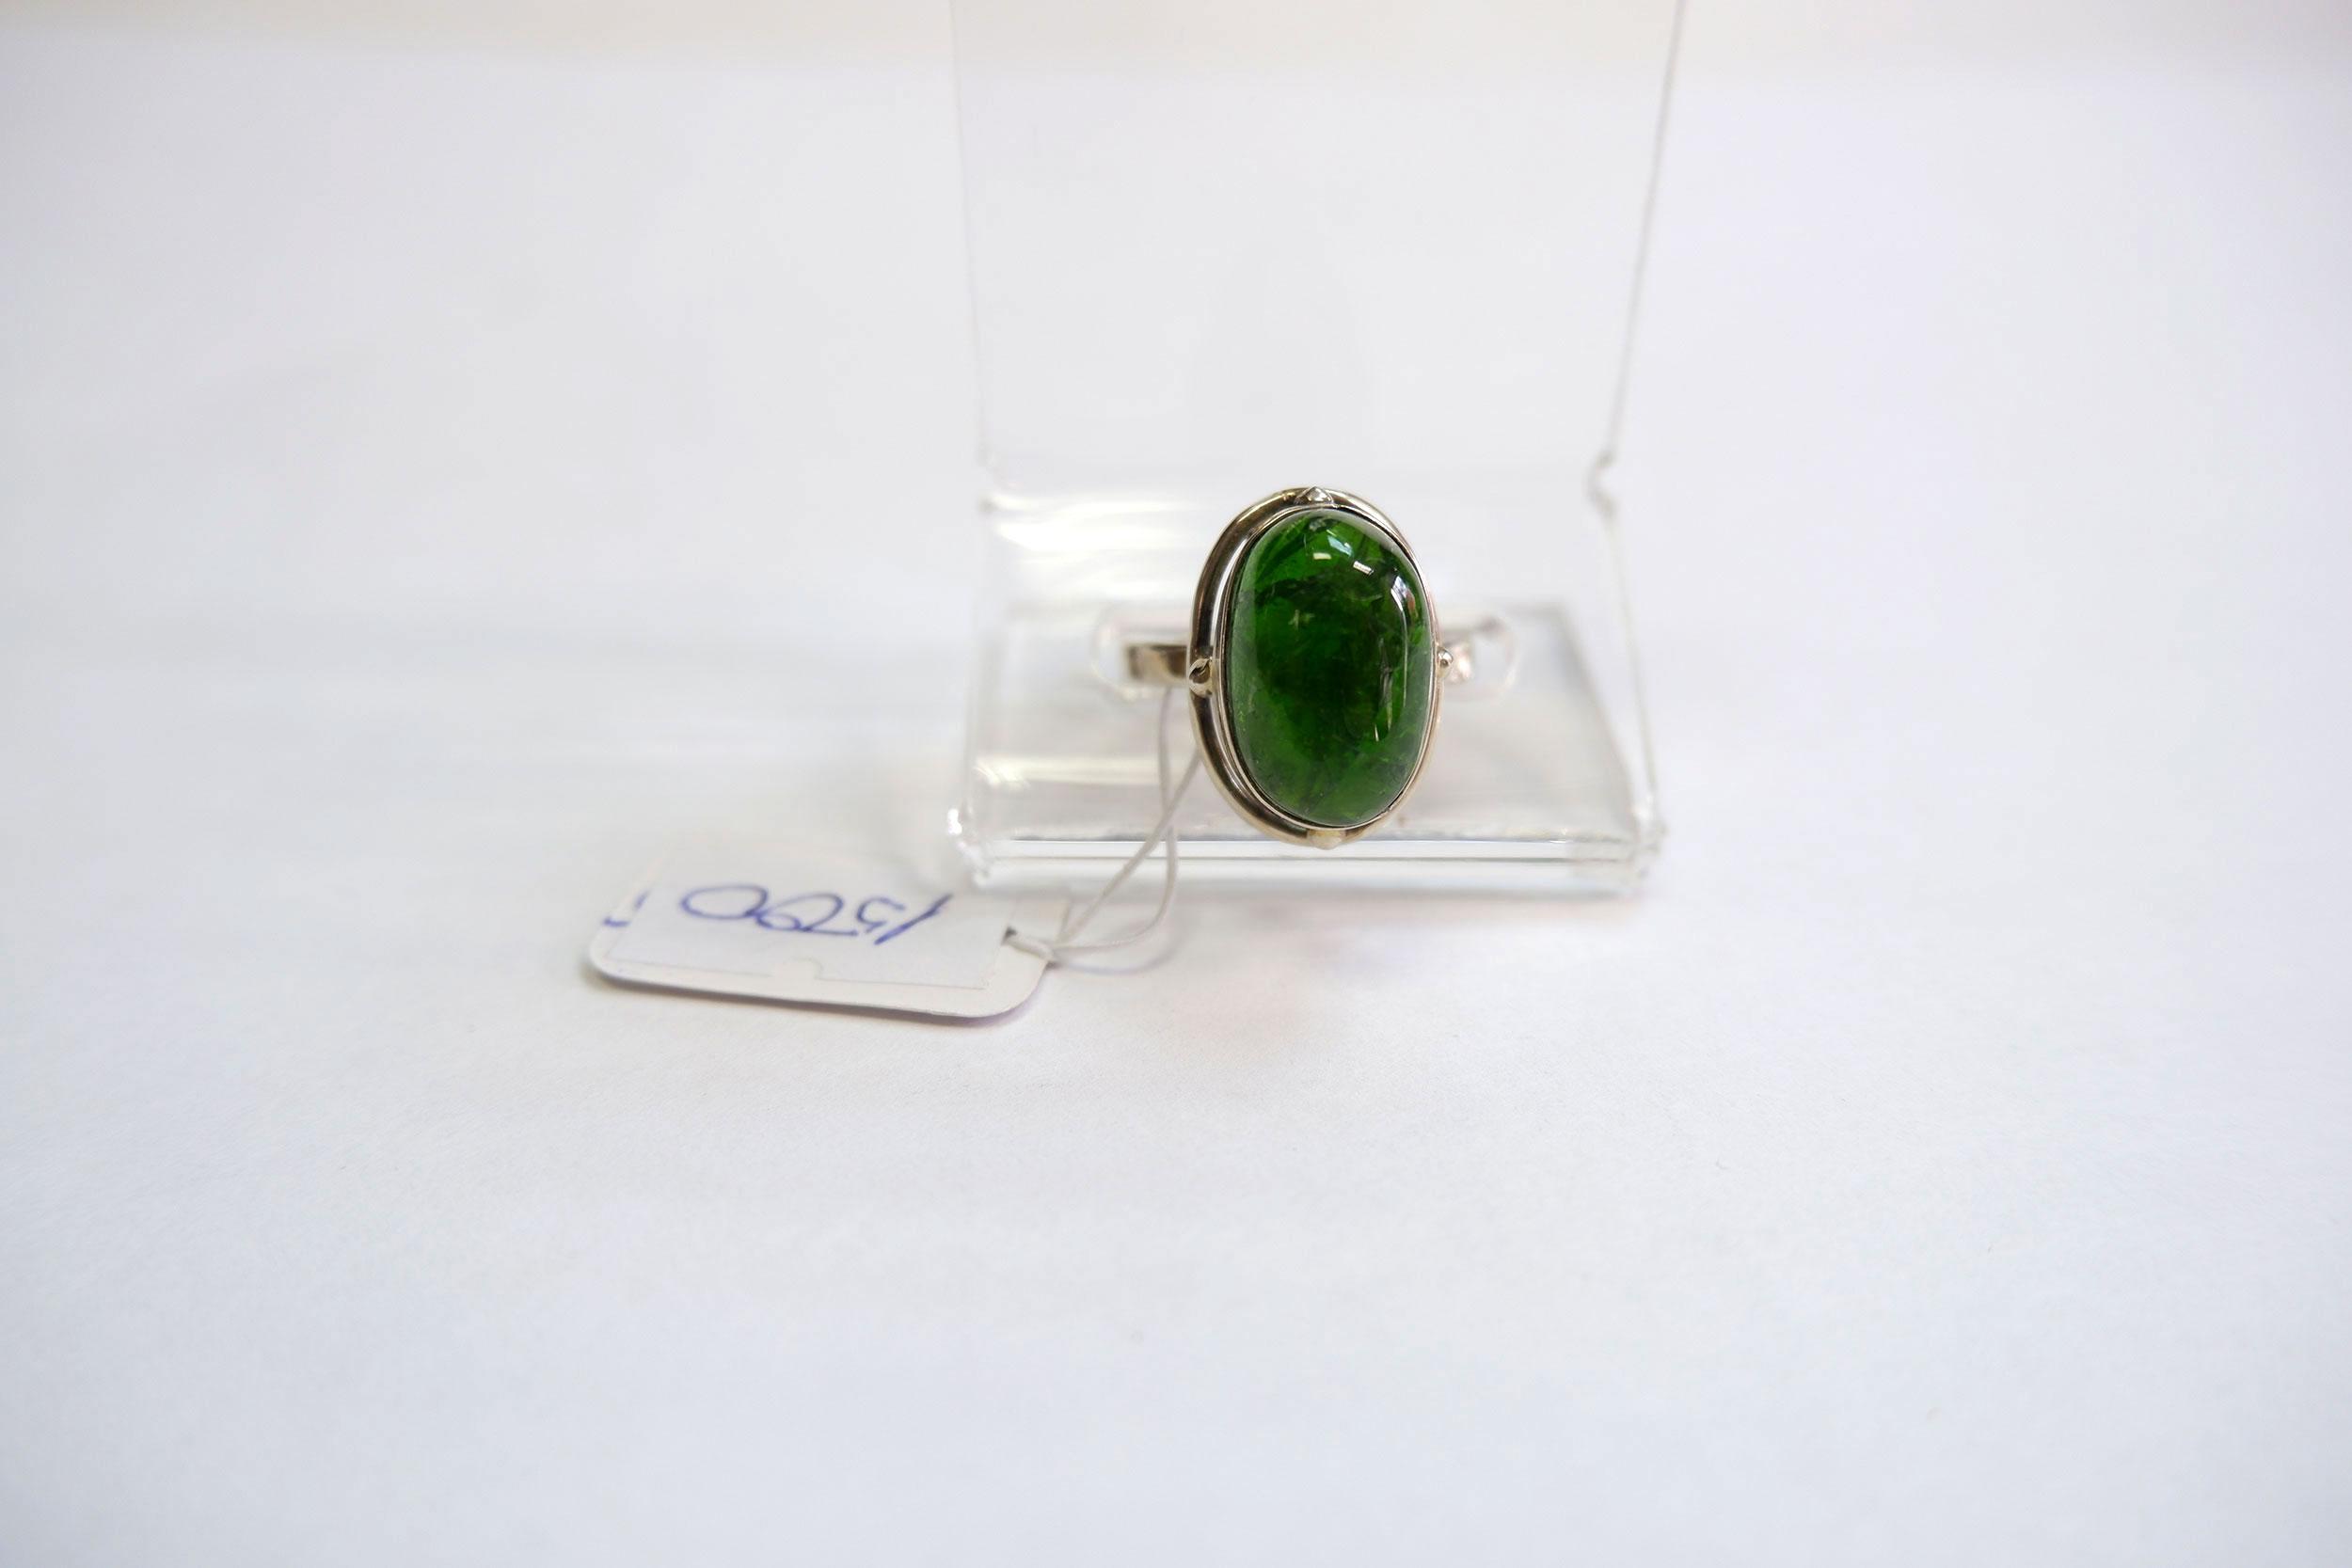 Кольцо из хромдиопсида